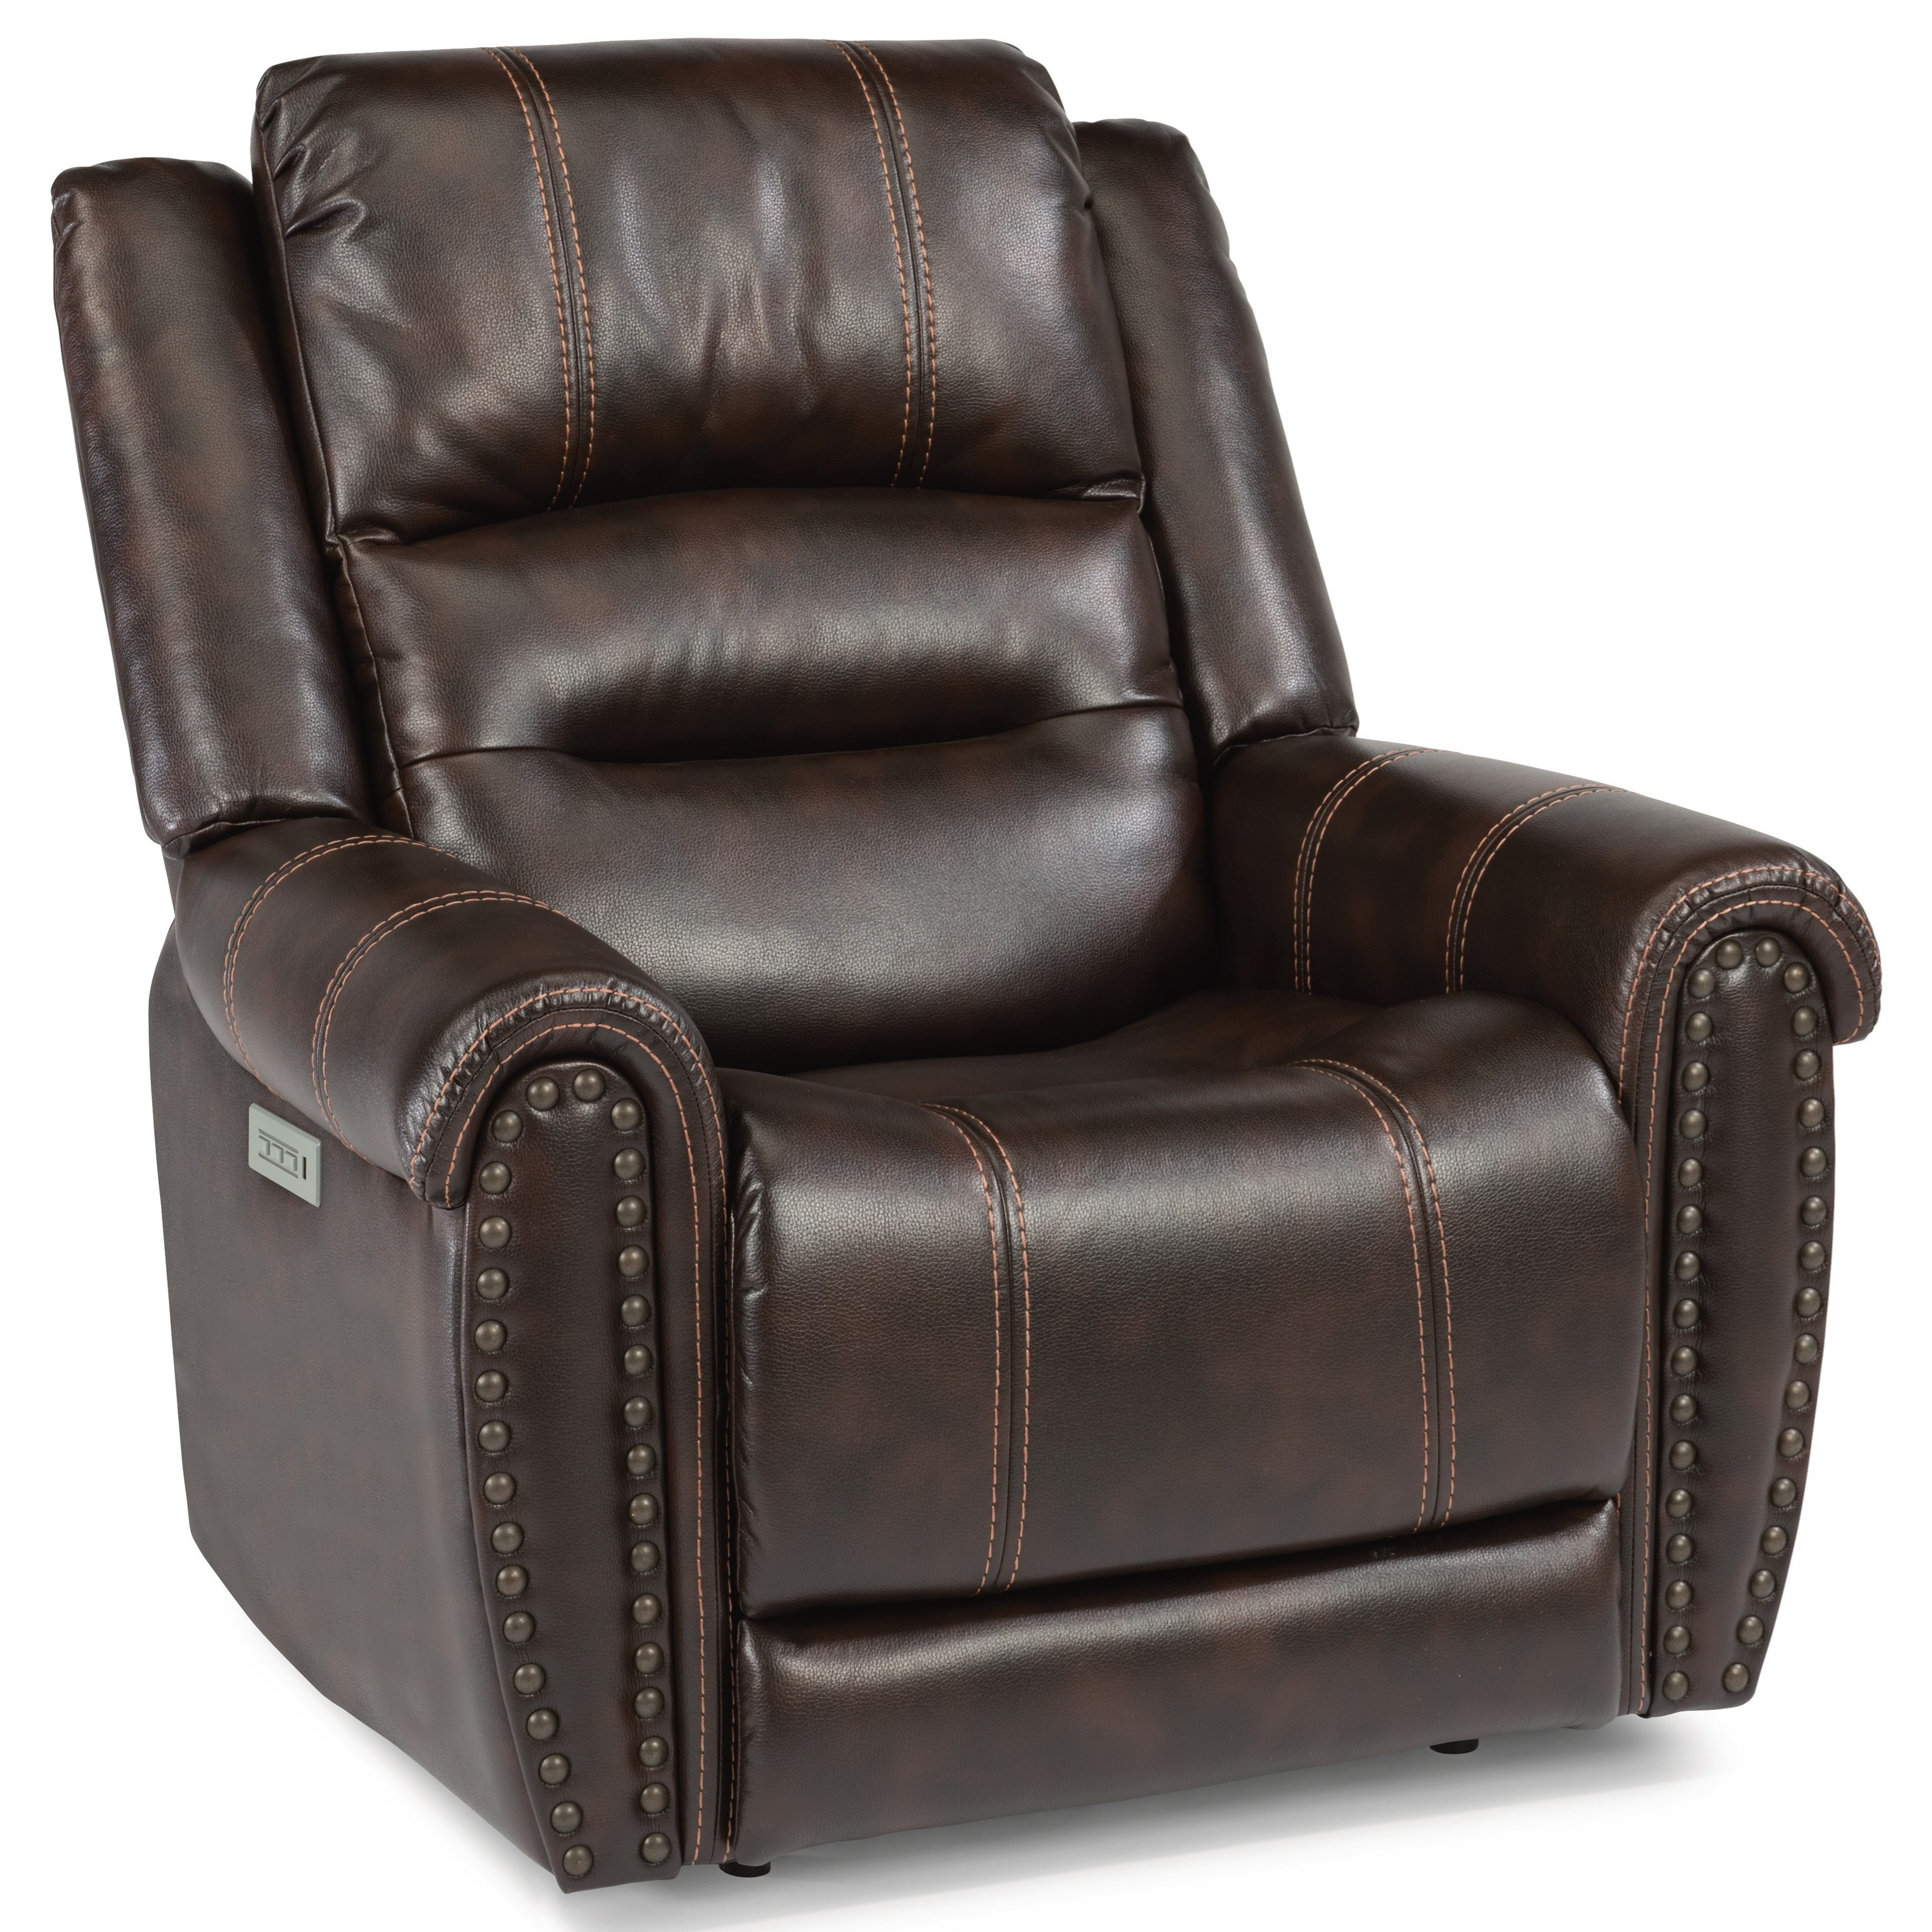 Latitudes - Oscar Power Recliner with Power Headrest by Flexsteel at Walker's Furniture